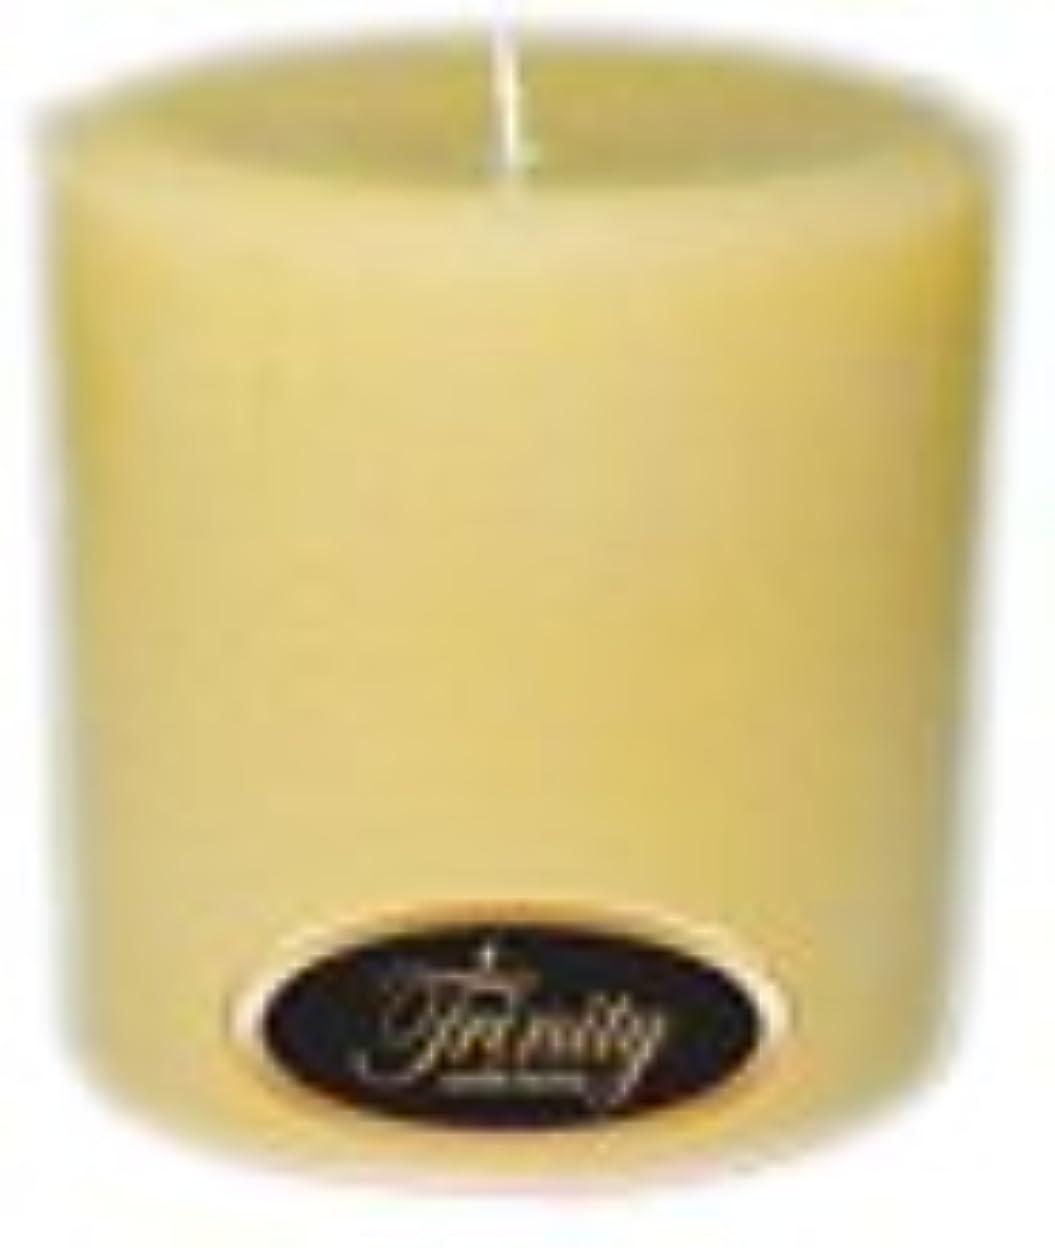 Trinity Candle工場 – Vanilla Spice – Pillar Candle – 4 x 4